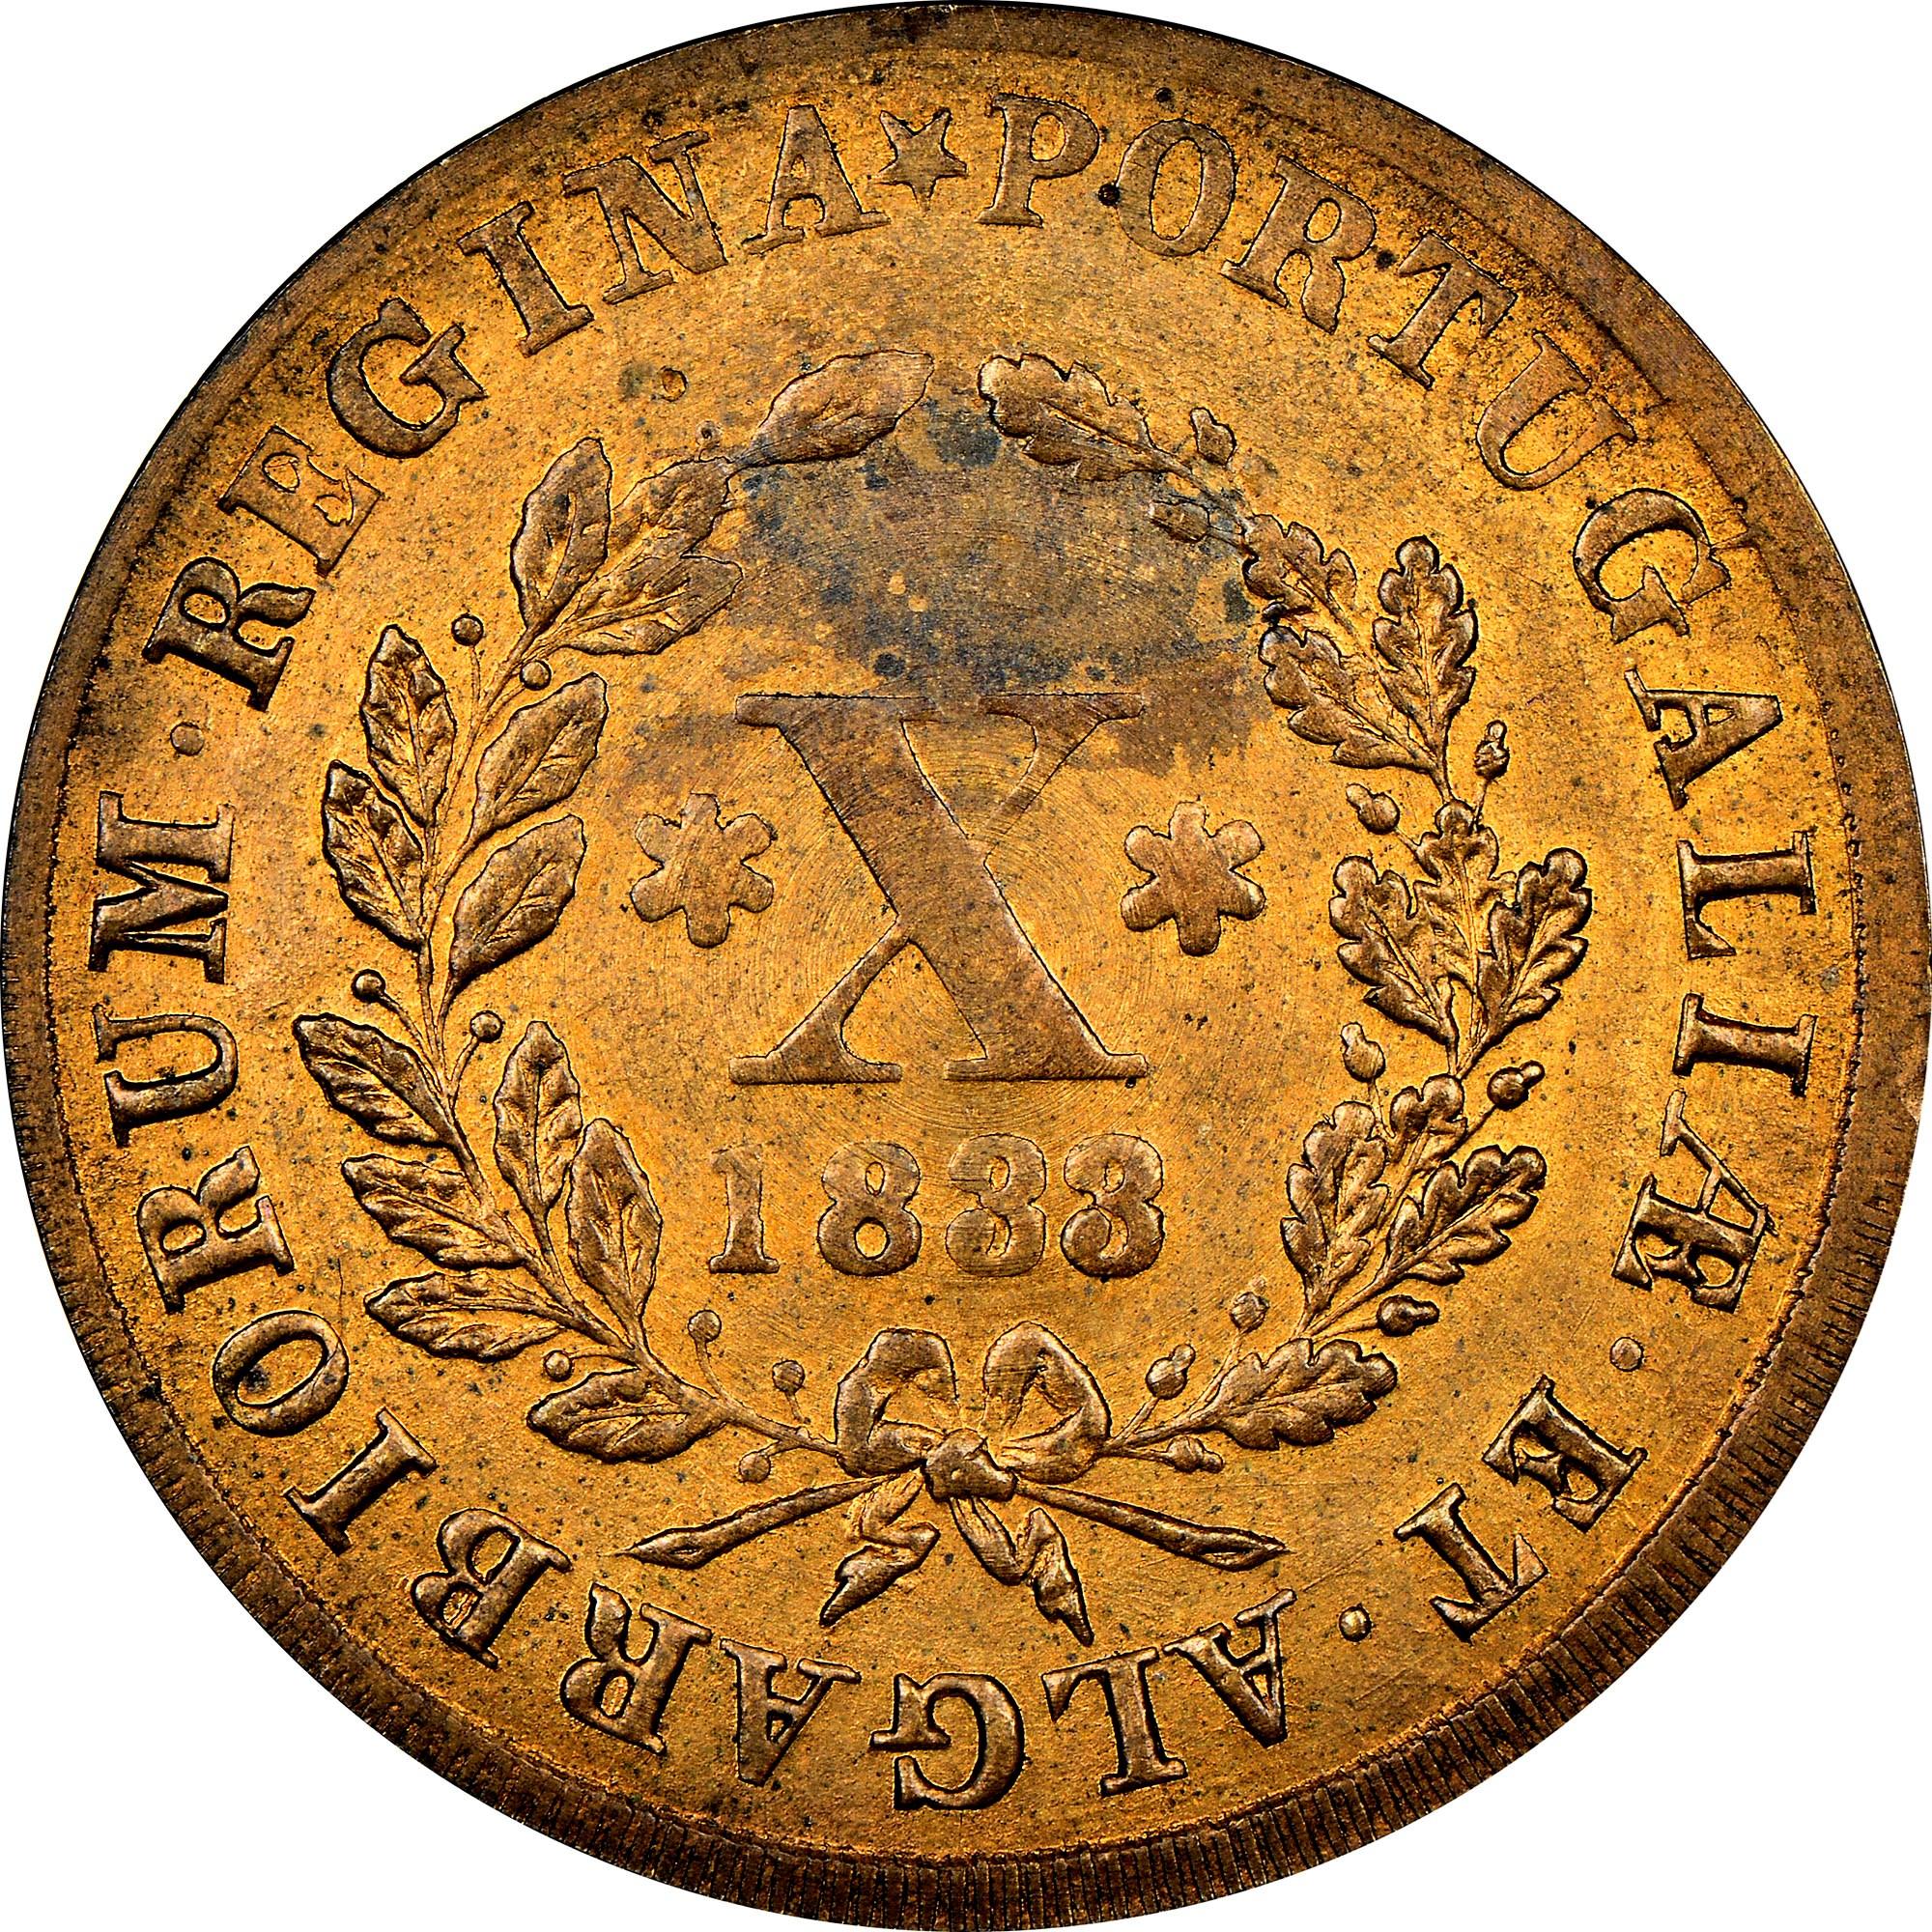 Portugal 10 Reis reverse